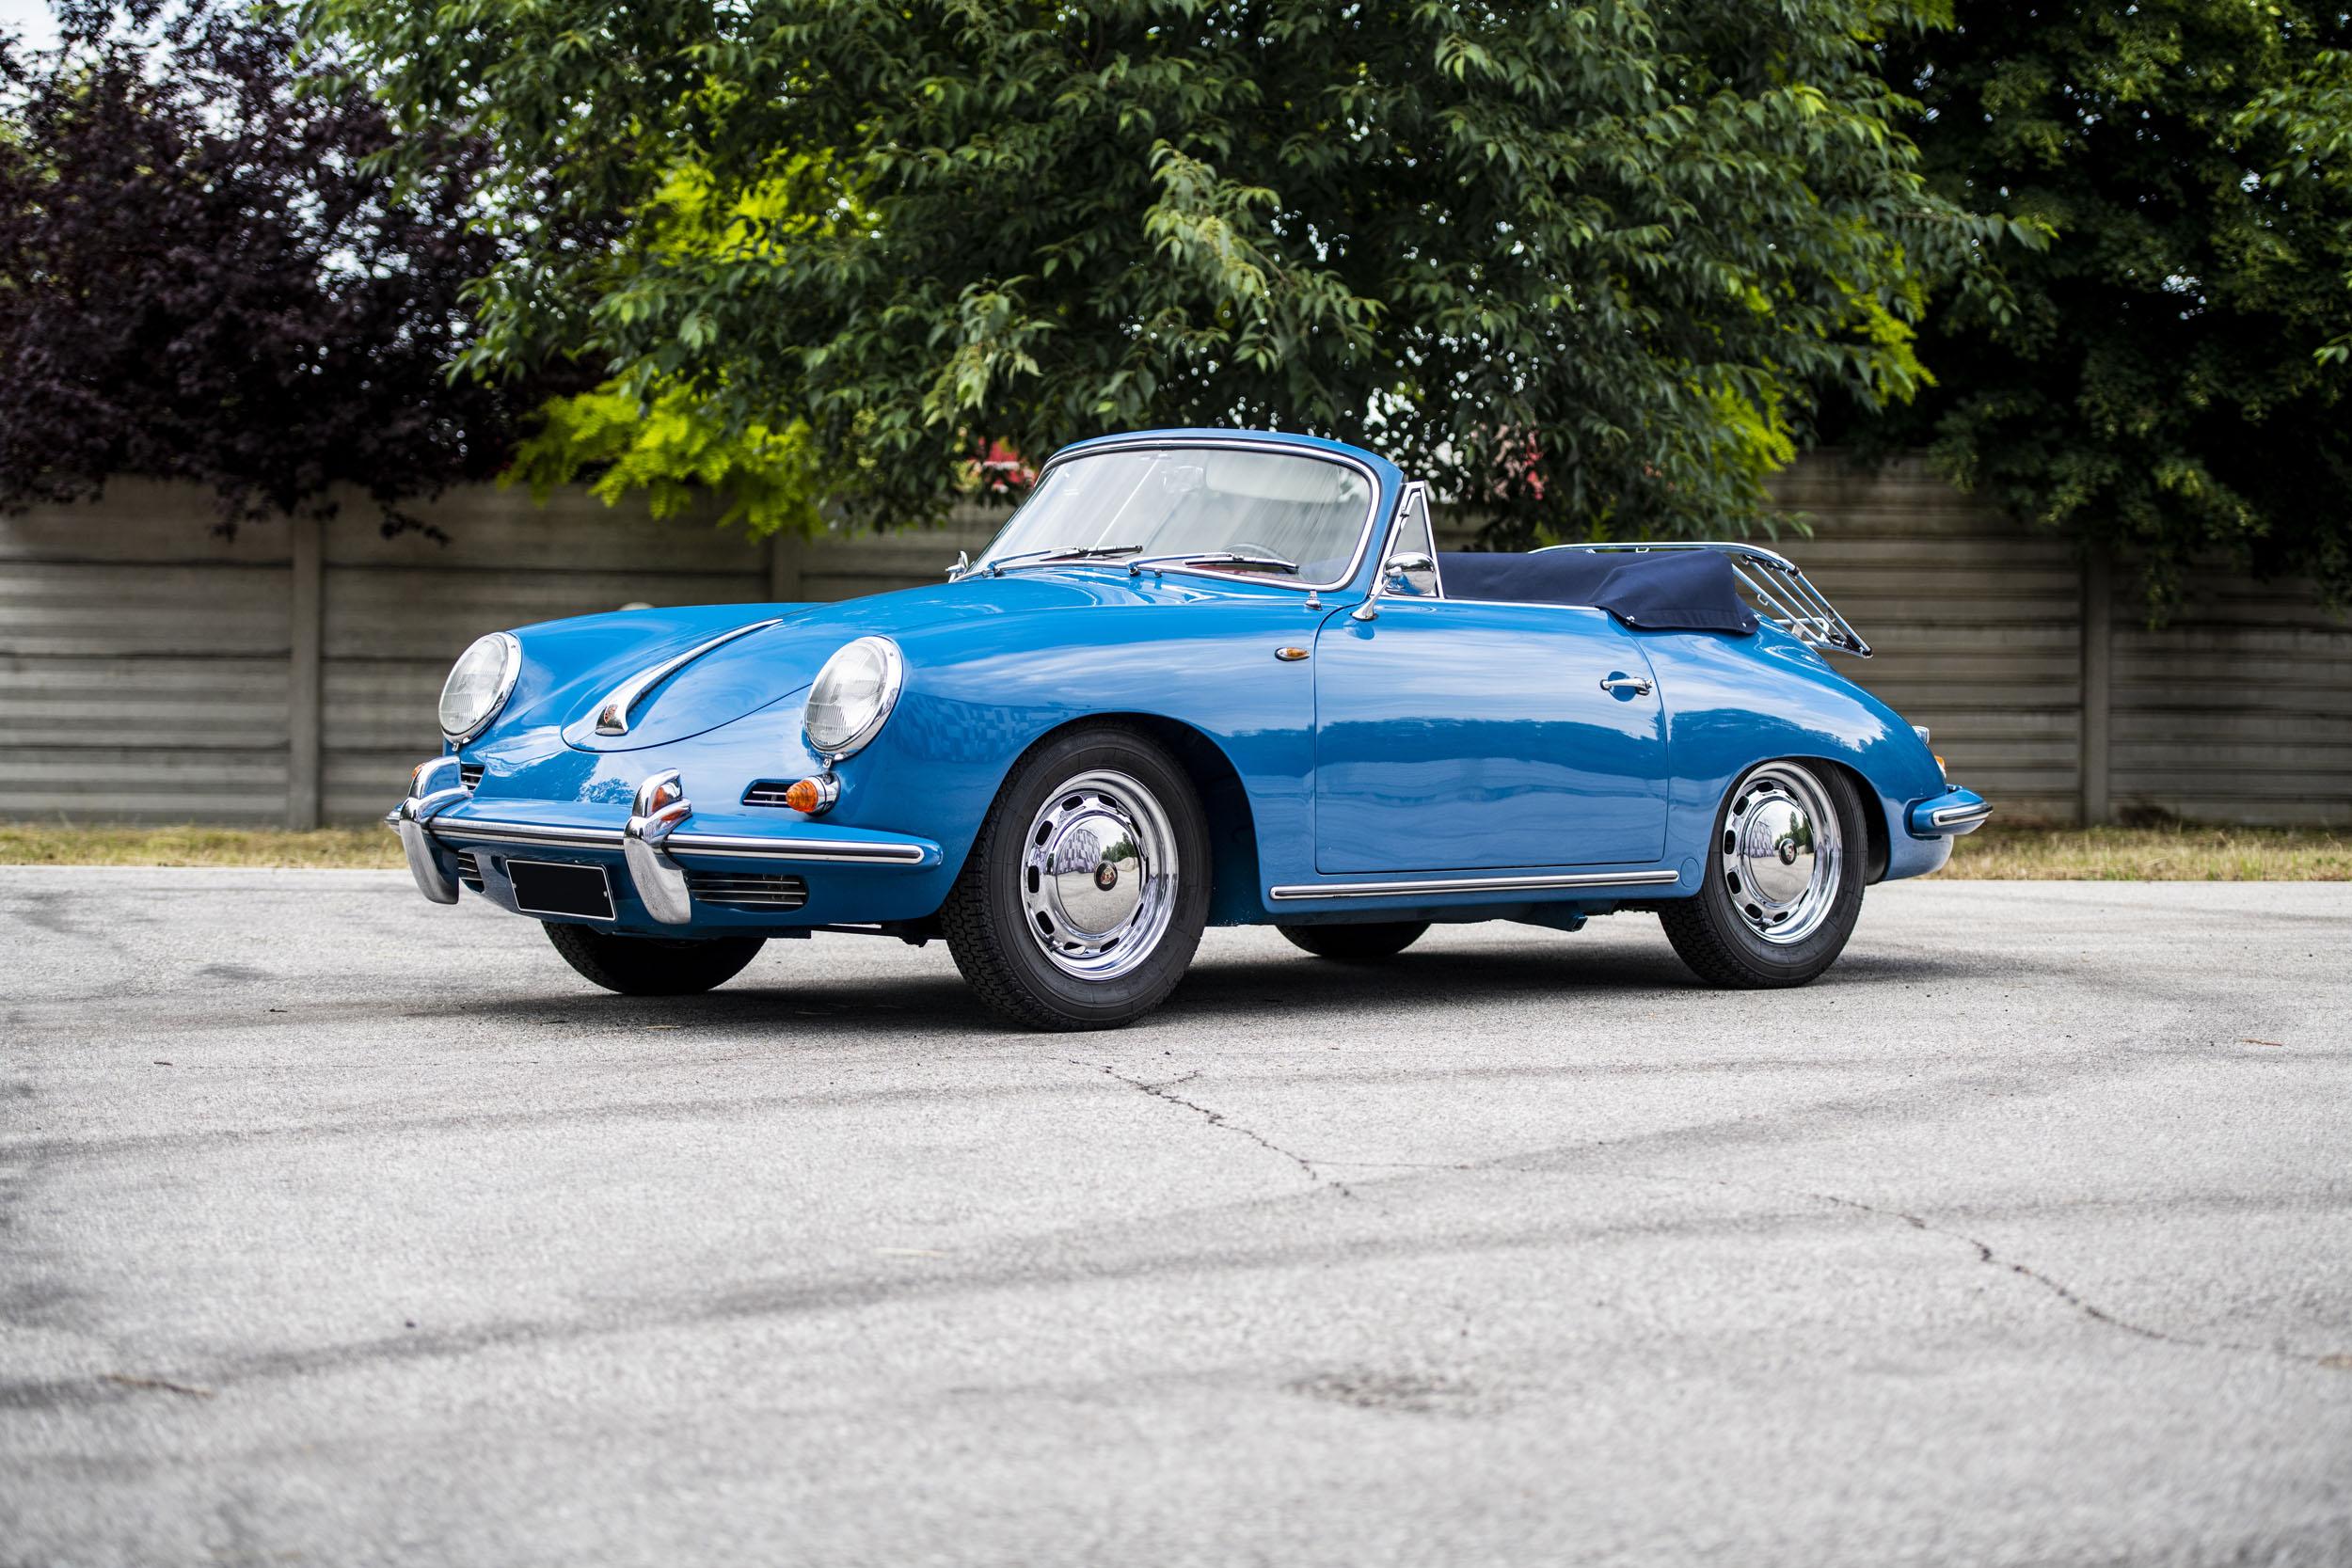 1960 Porsche 356 Super 90 Cabriolet (Credit – Remi Dargegen ©2020 Courtesy of RM Sotheby's) (4)